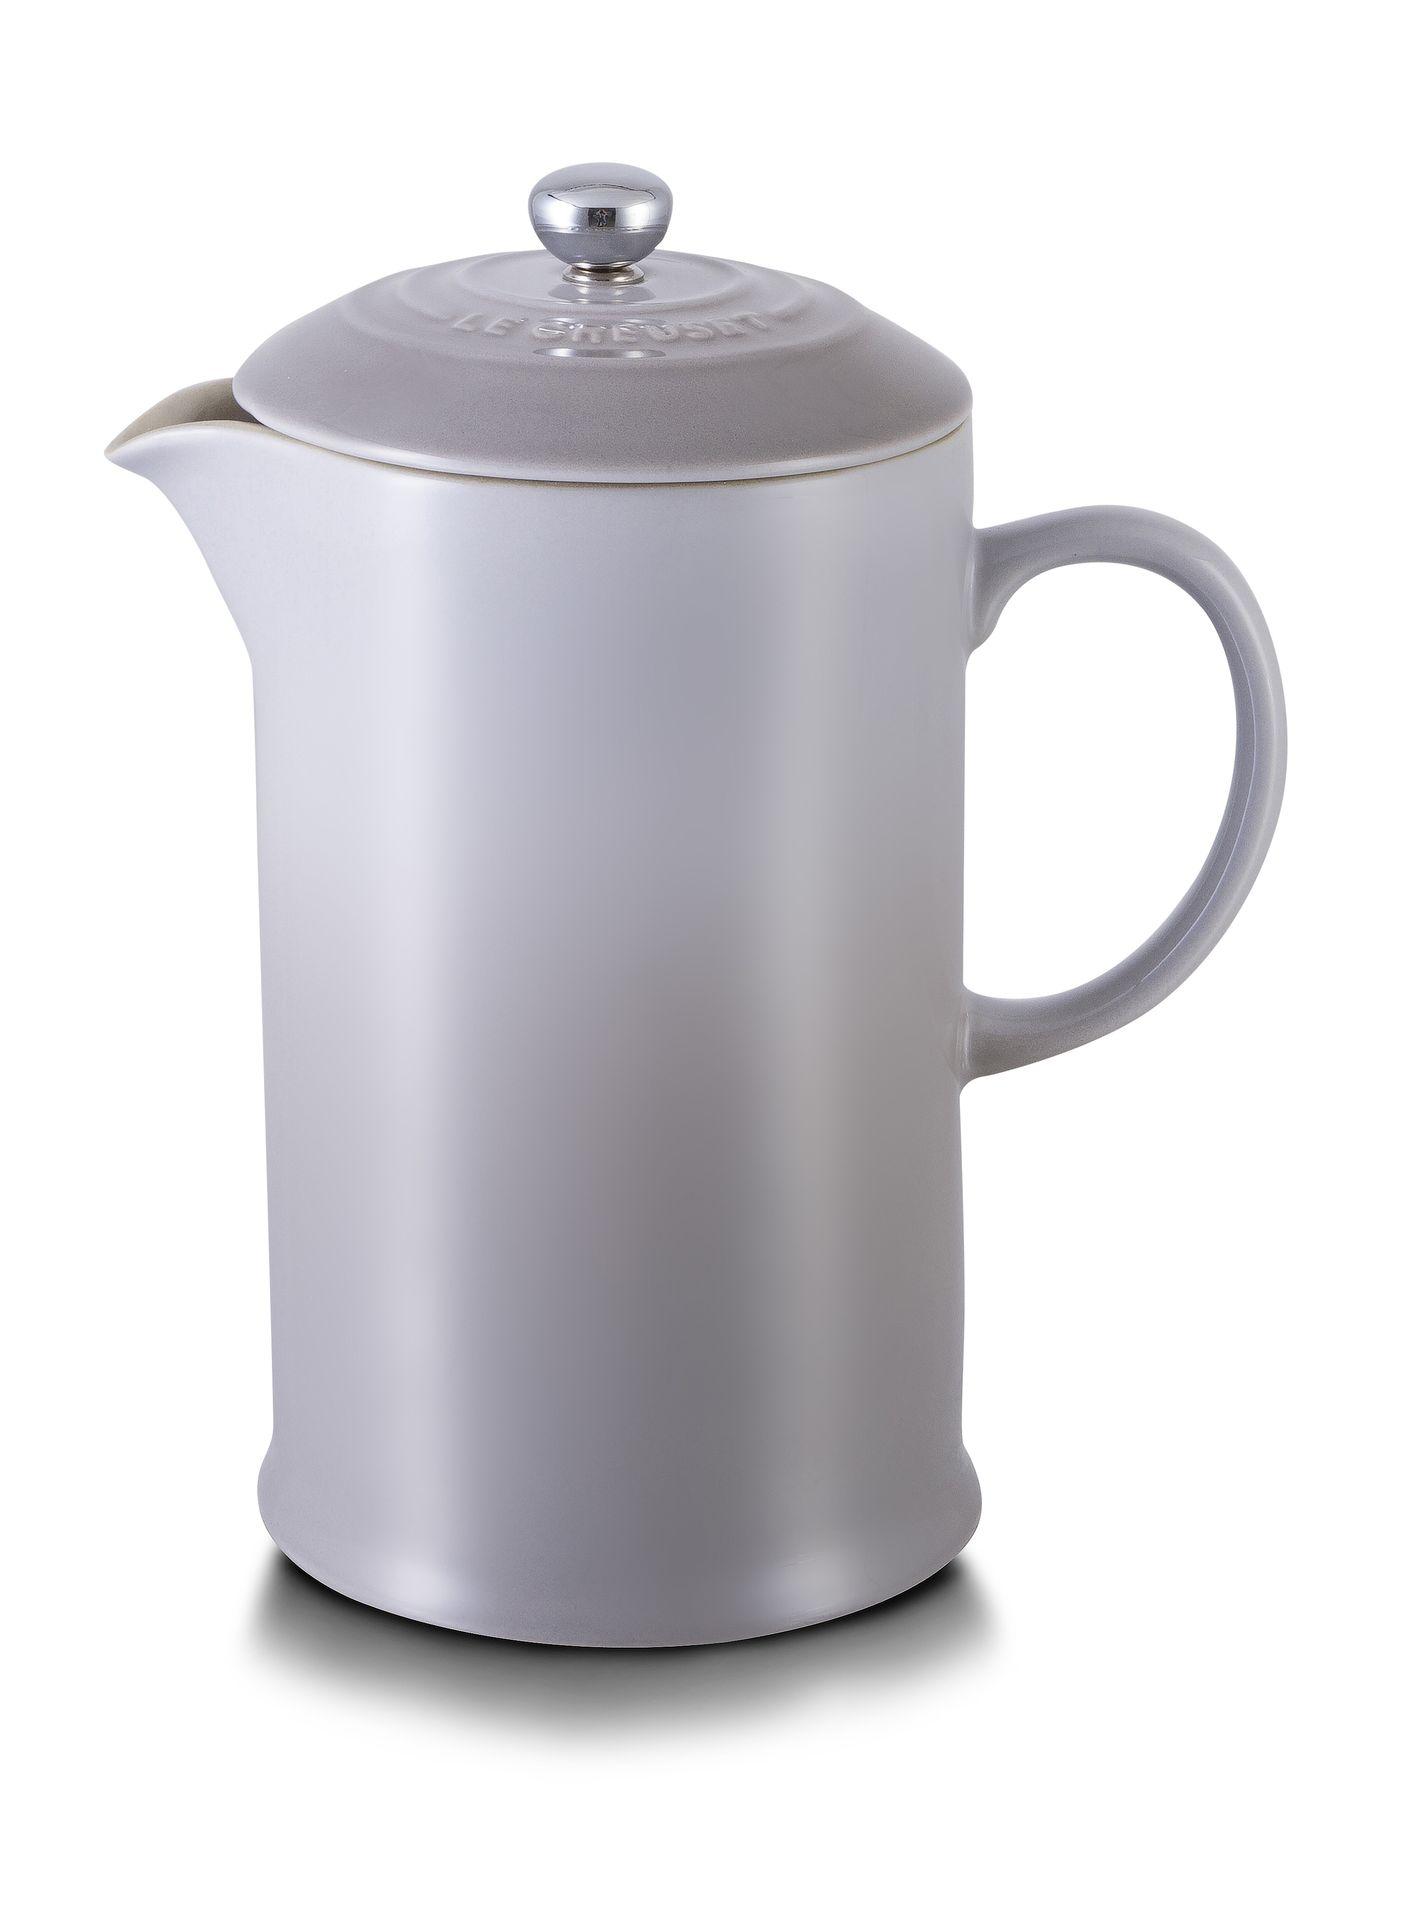 Le Creuset Kaffee-Bereiter Perlgrau